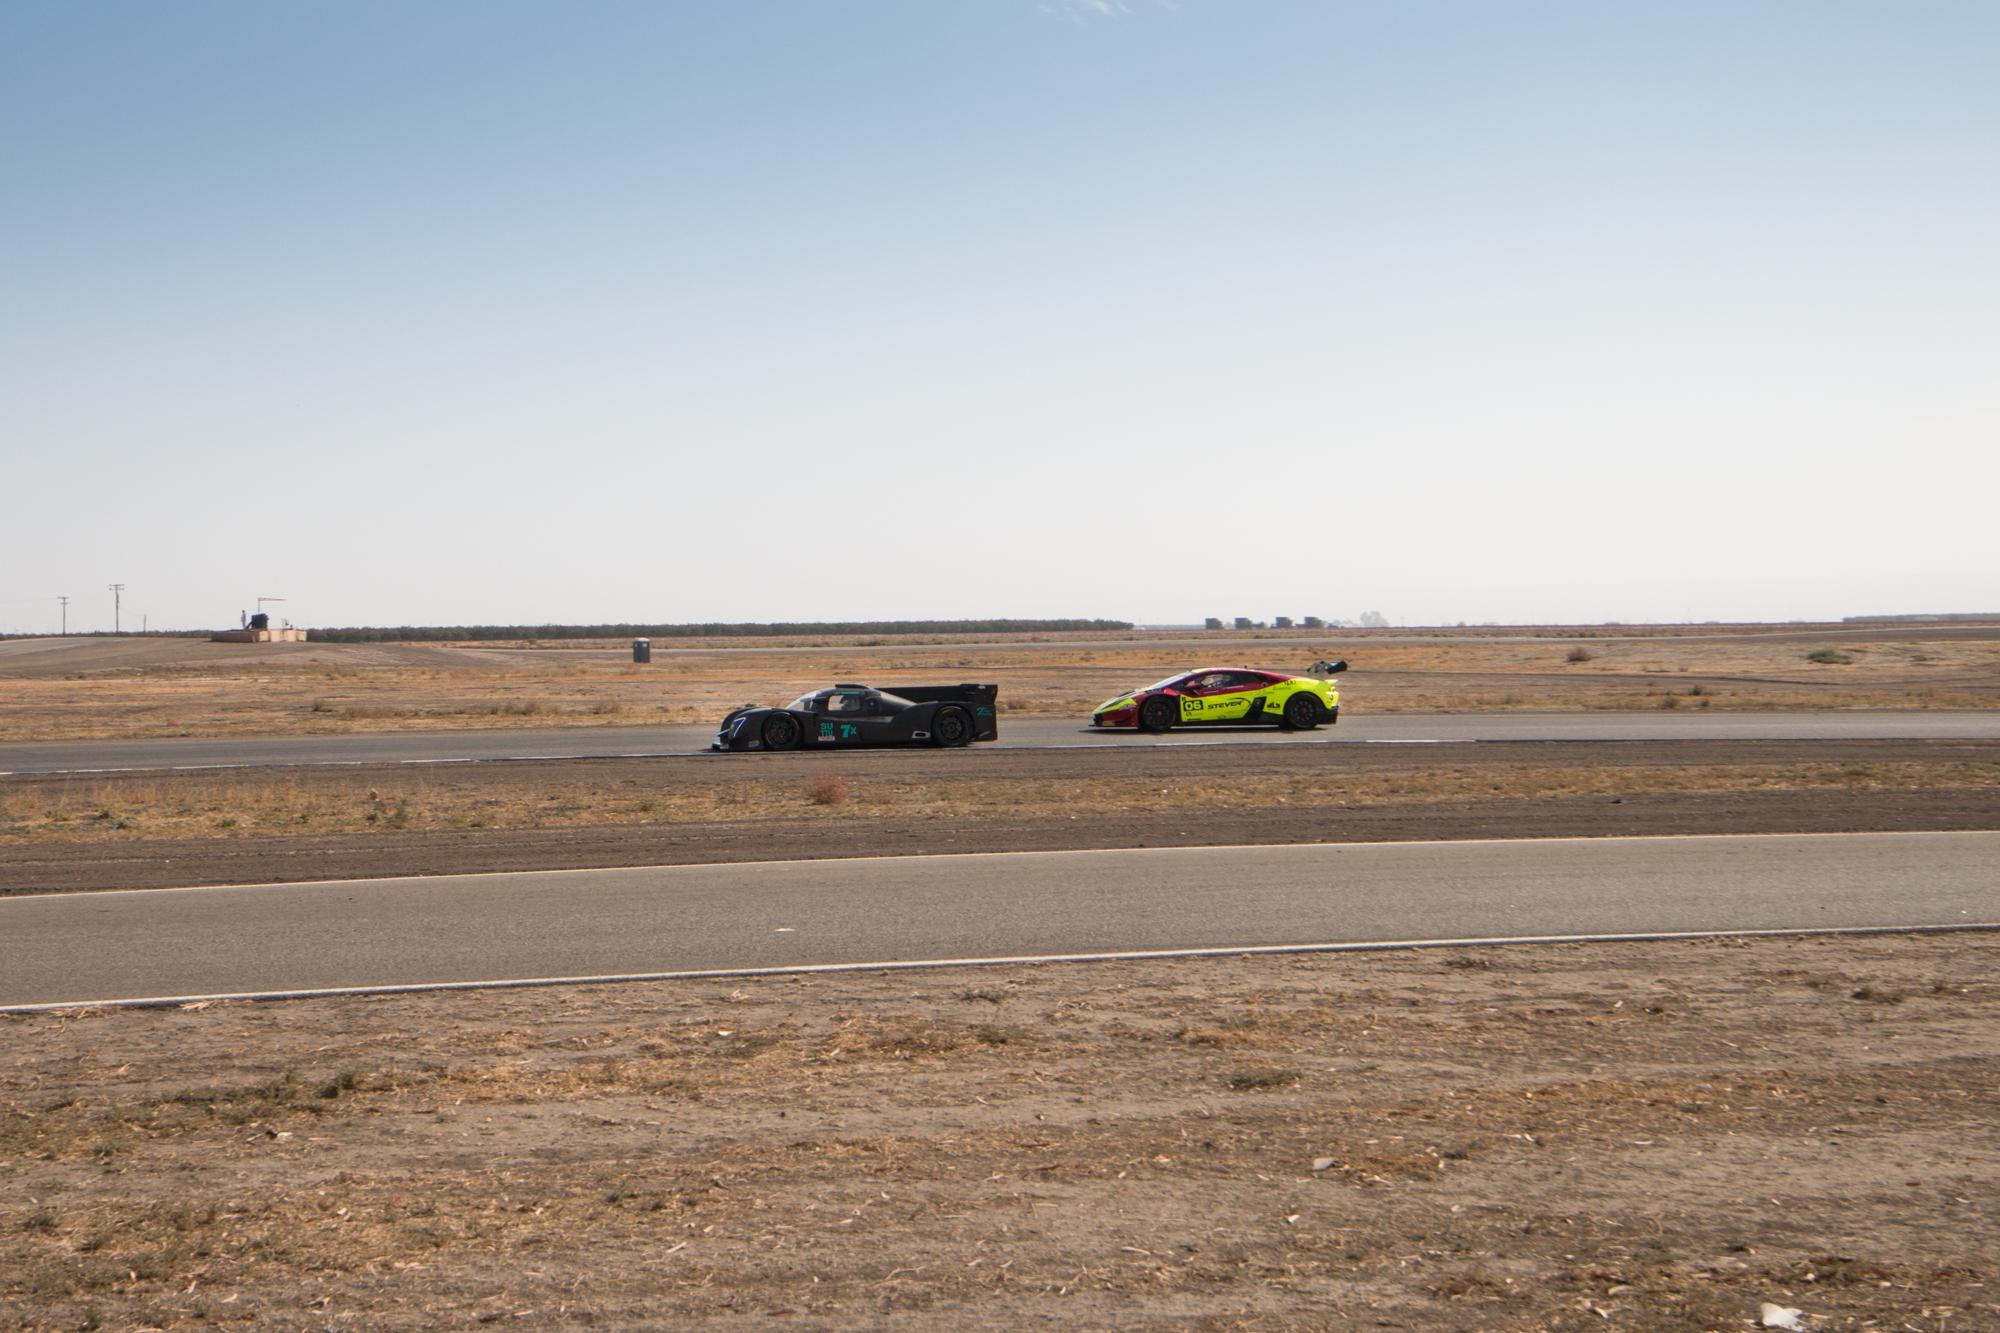 Steven-Racing-20130301-55518.jpg